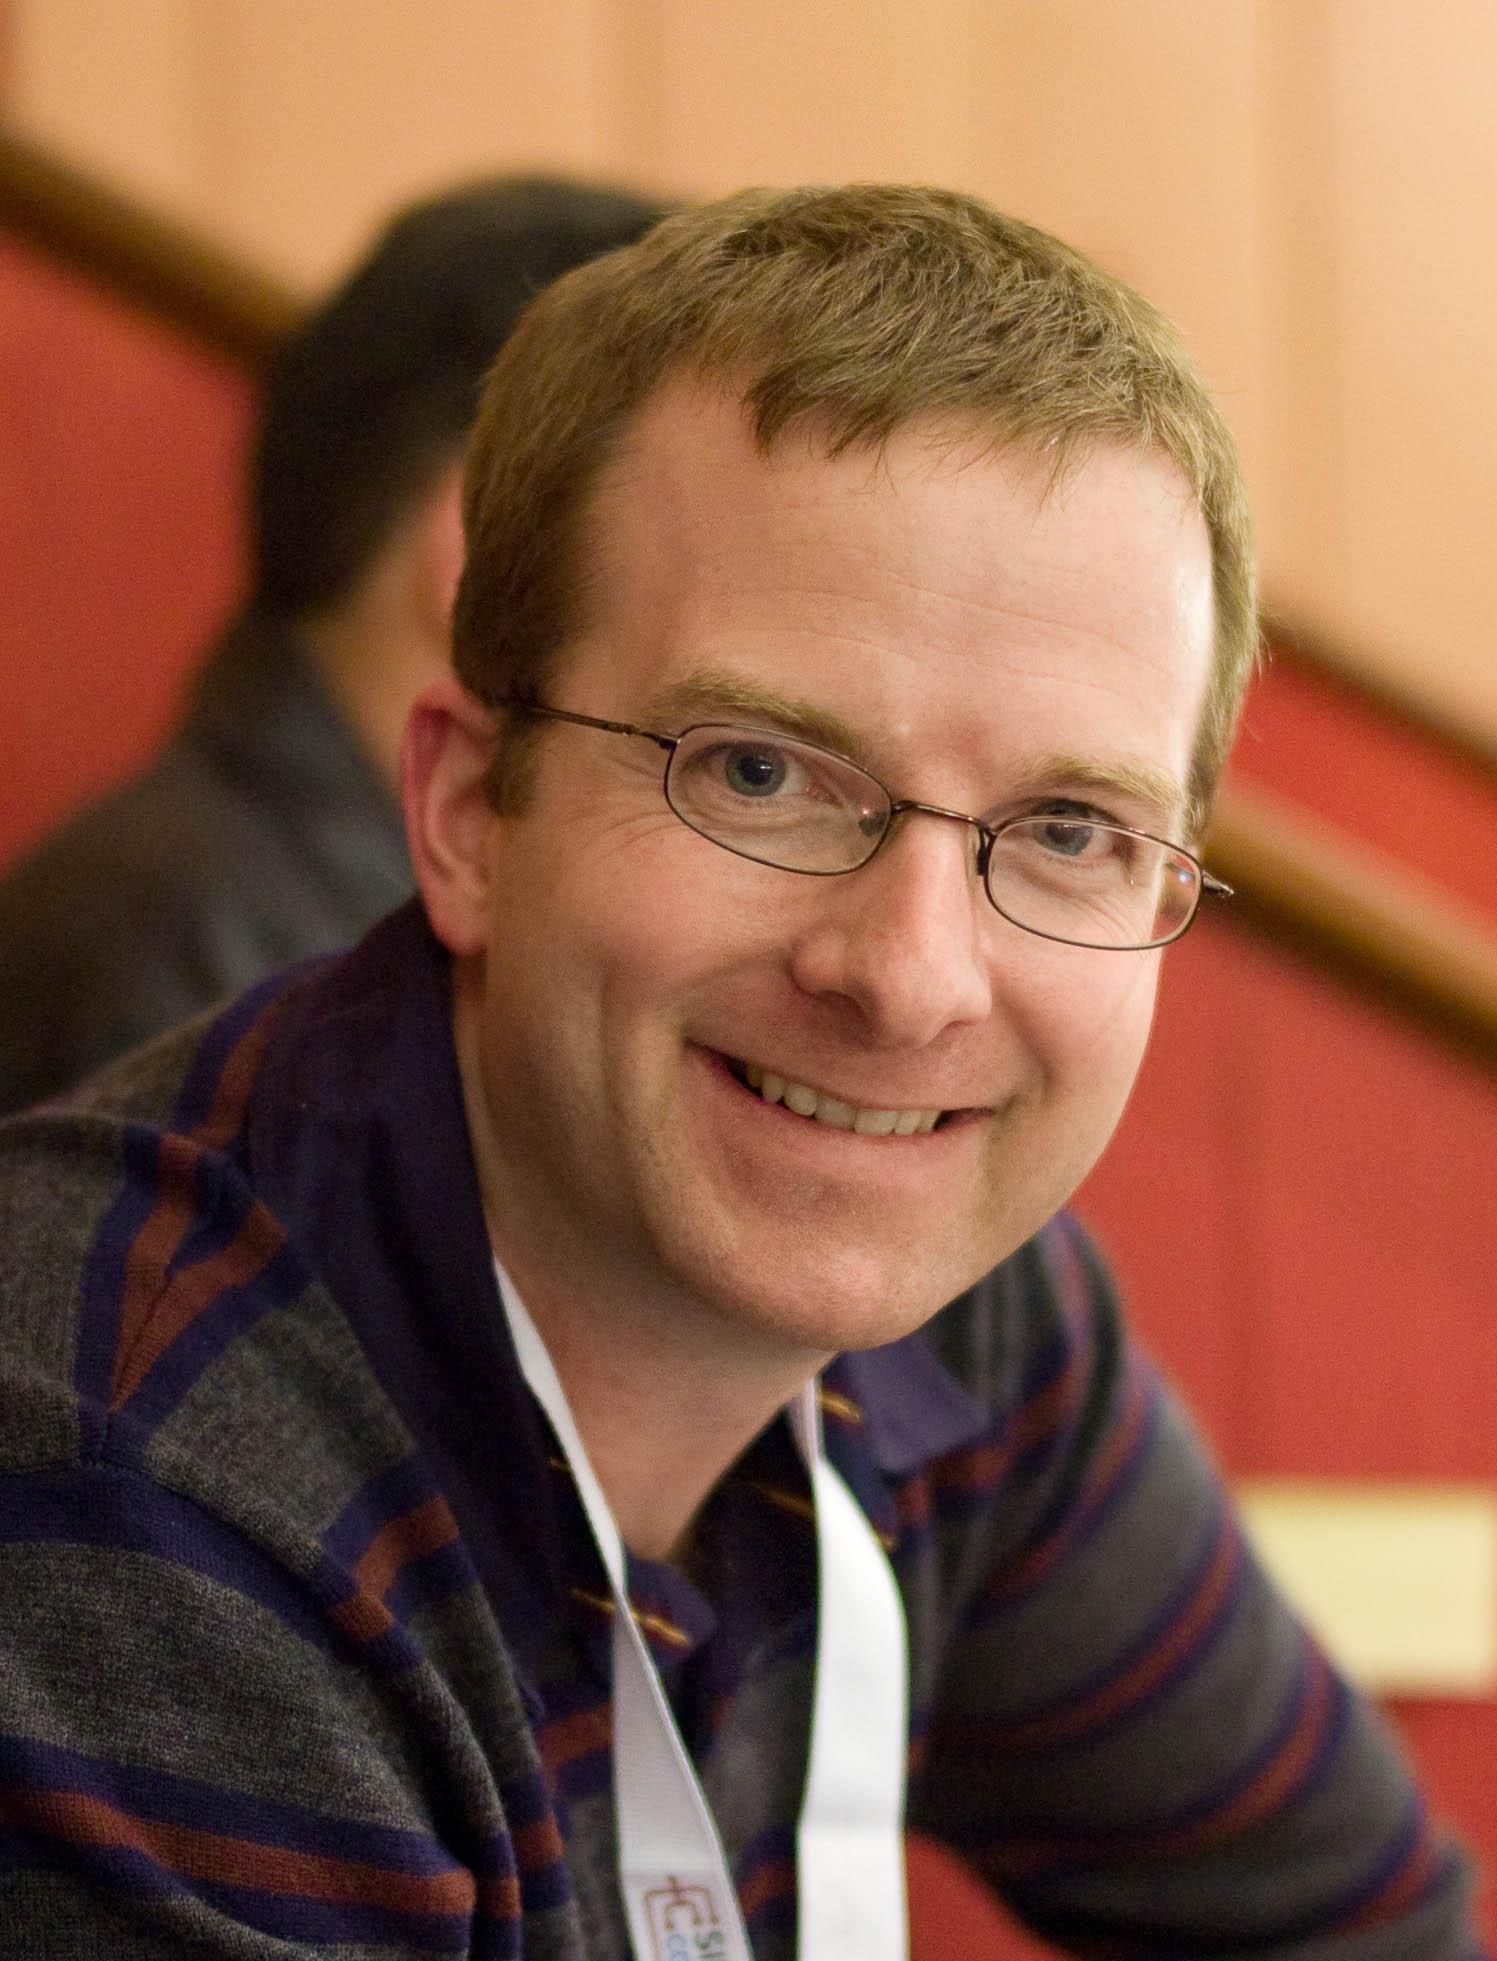 Mike Schroepfer - Wikipedia